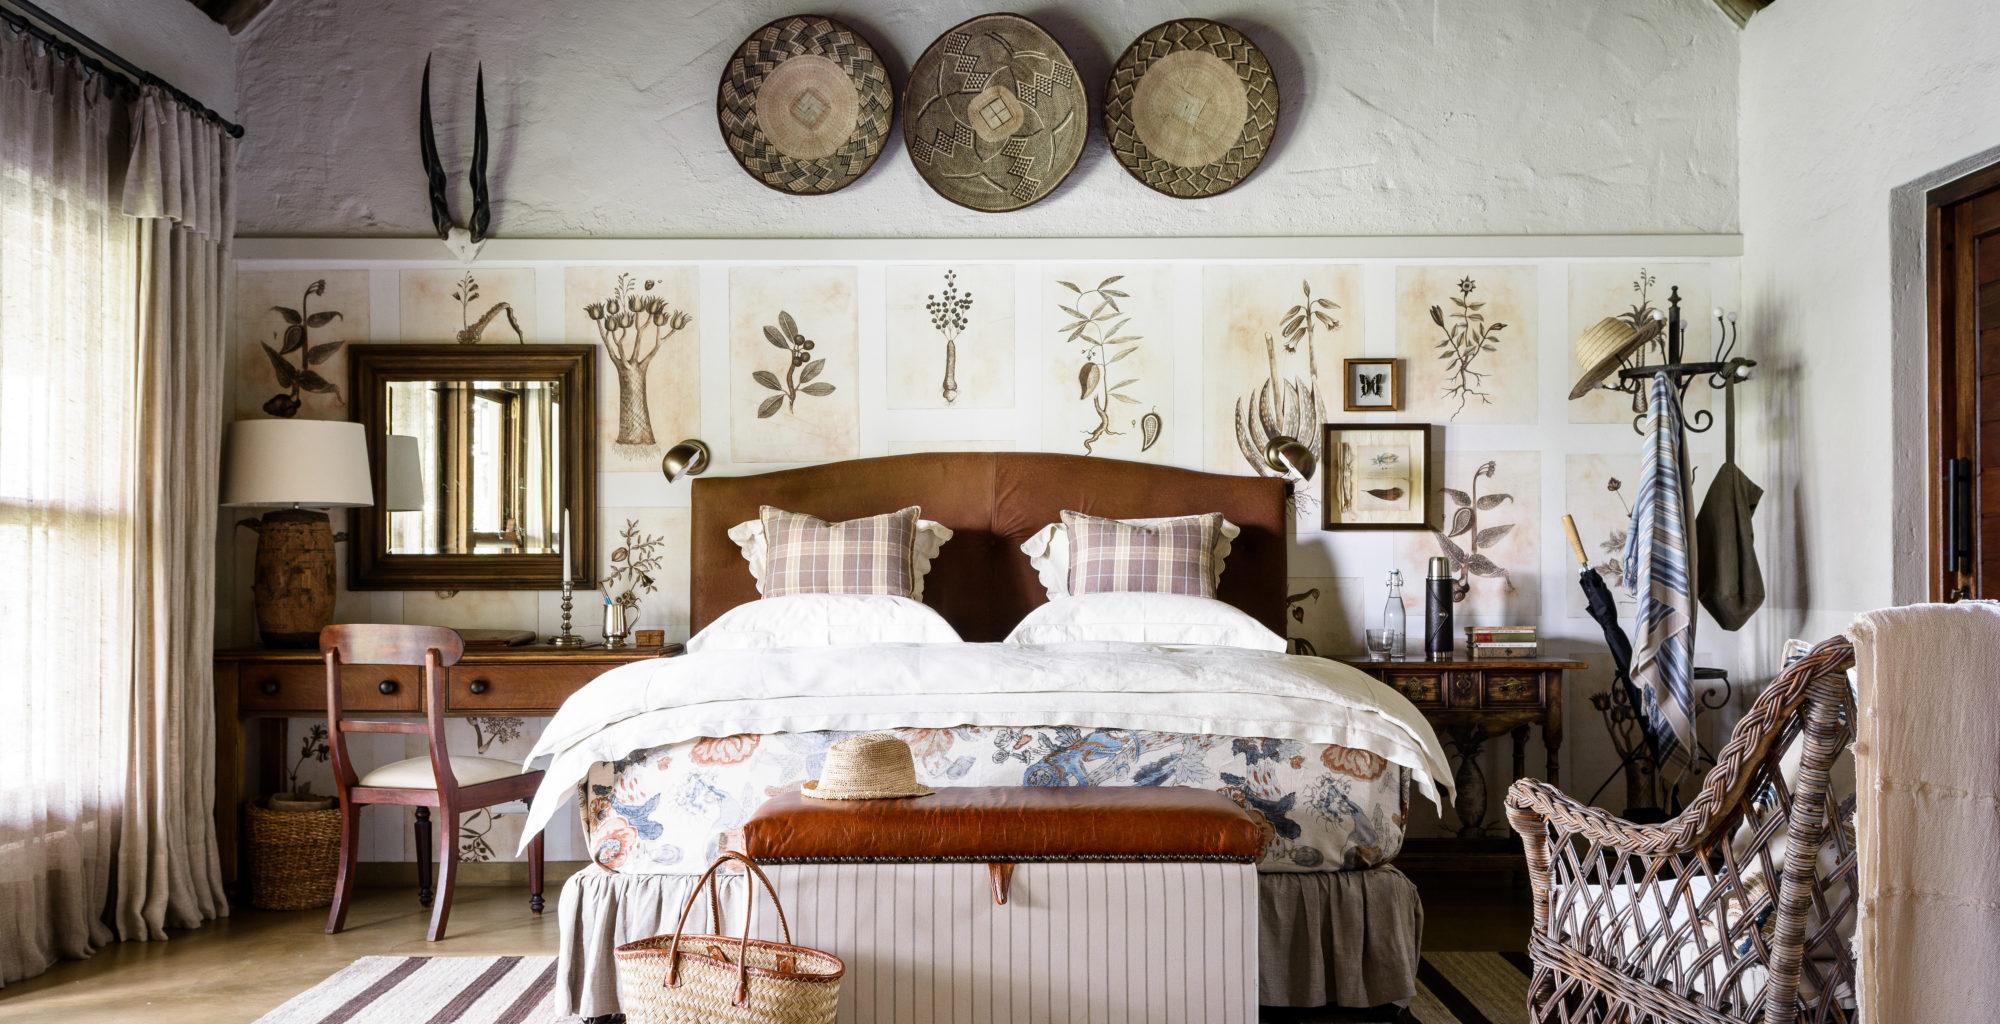 South-Africa-Singita-Castleton-Bedroom